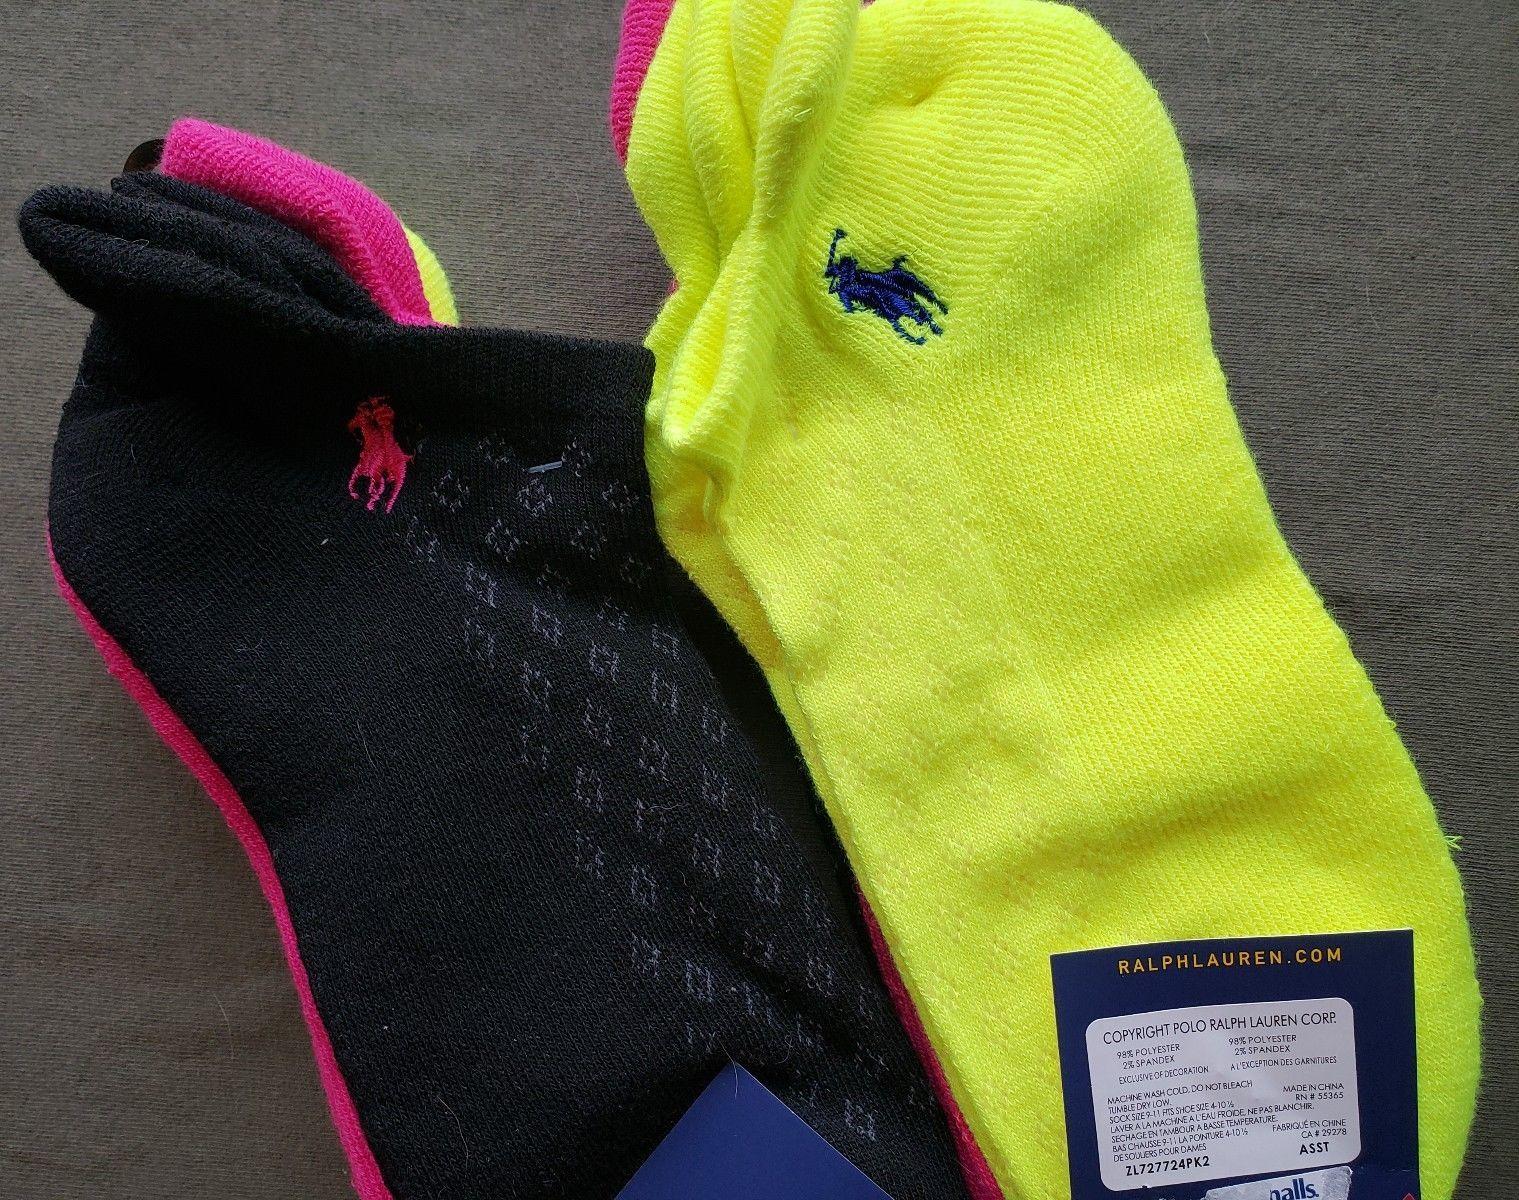 Polo Ralph Lauren Women's Ankle Socks 6 Pack 9-11 Black Pink Neon Sport Cushion